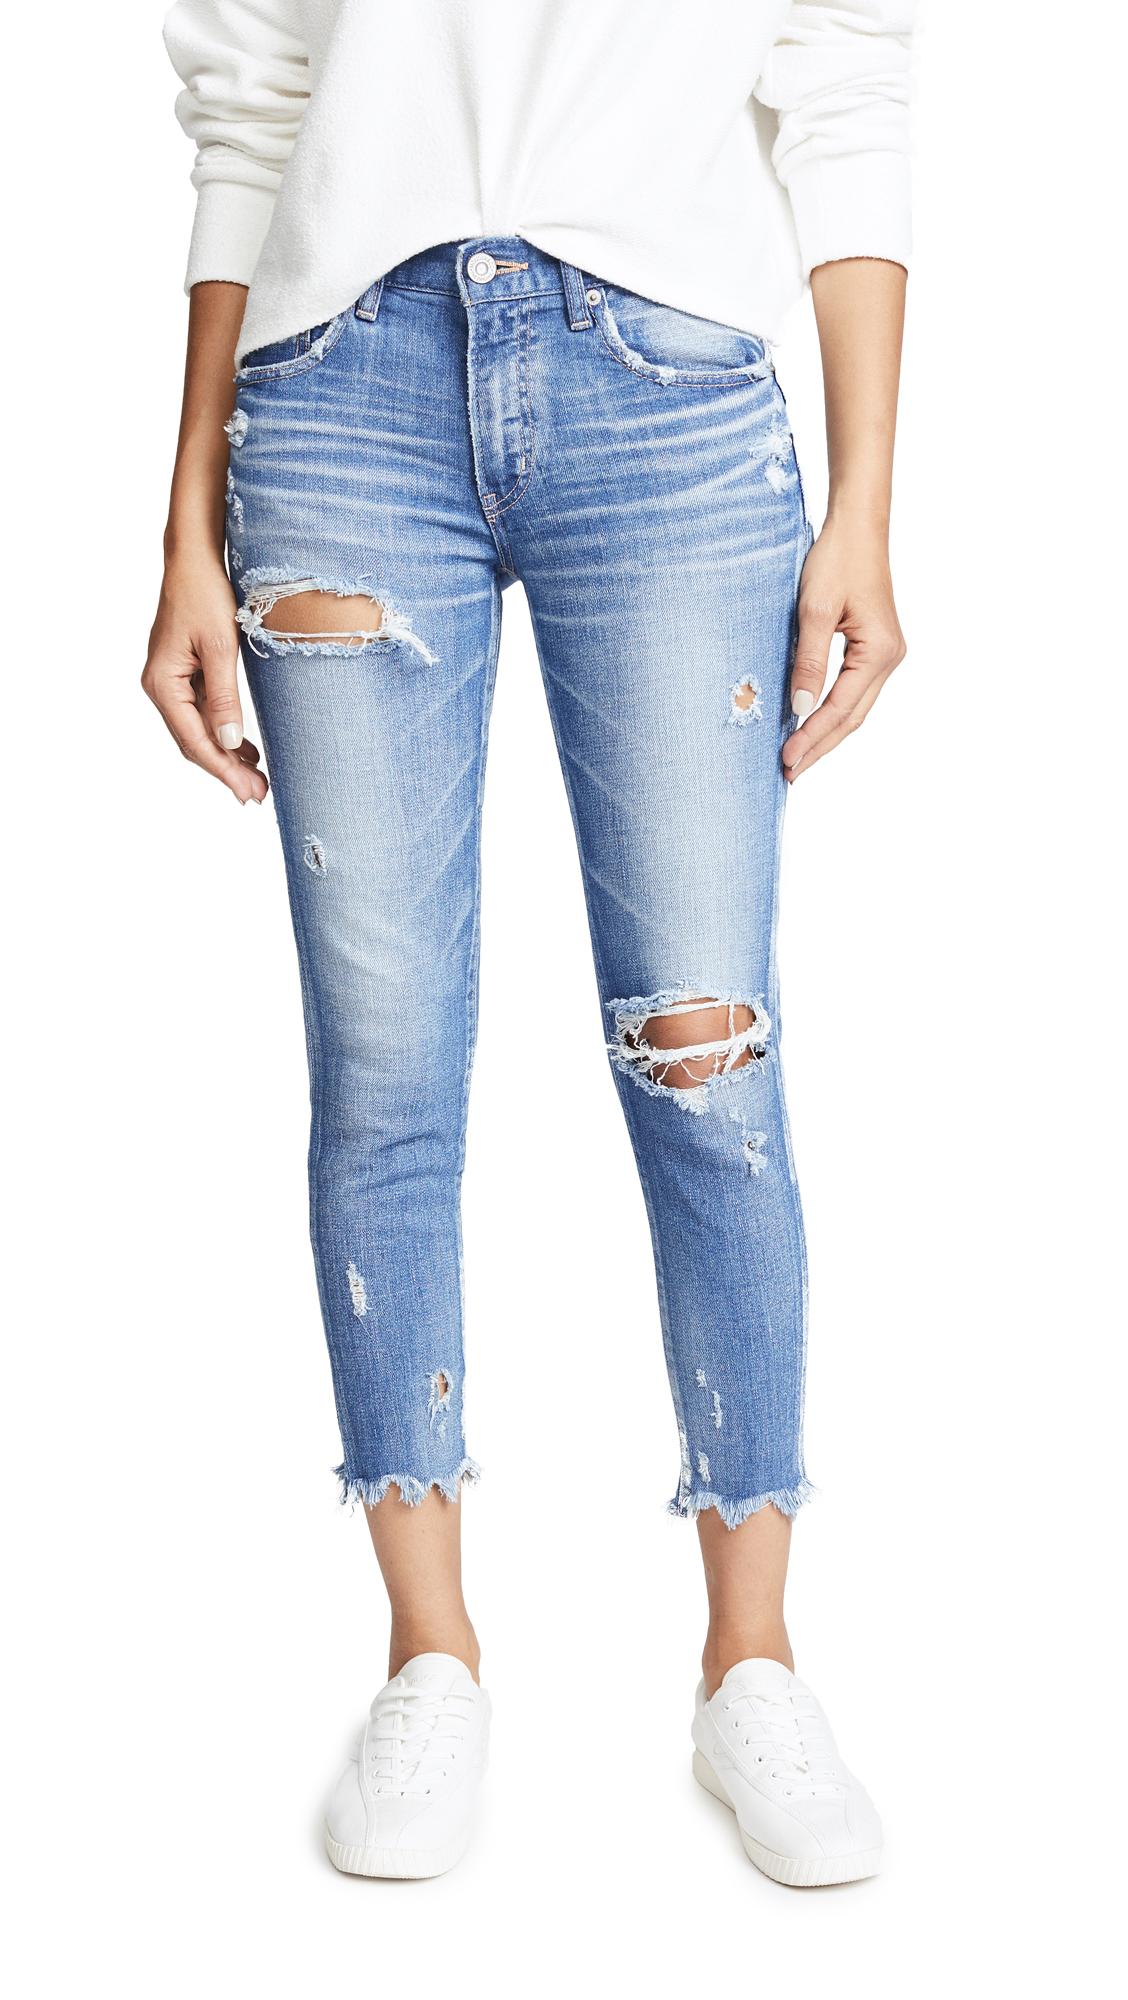 MOUSSY VINTAGE iSKO Comfort Ridegewood Skinny Jeans In Light Blue